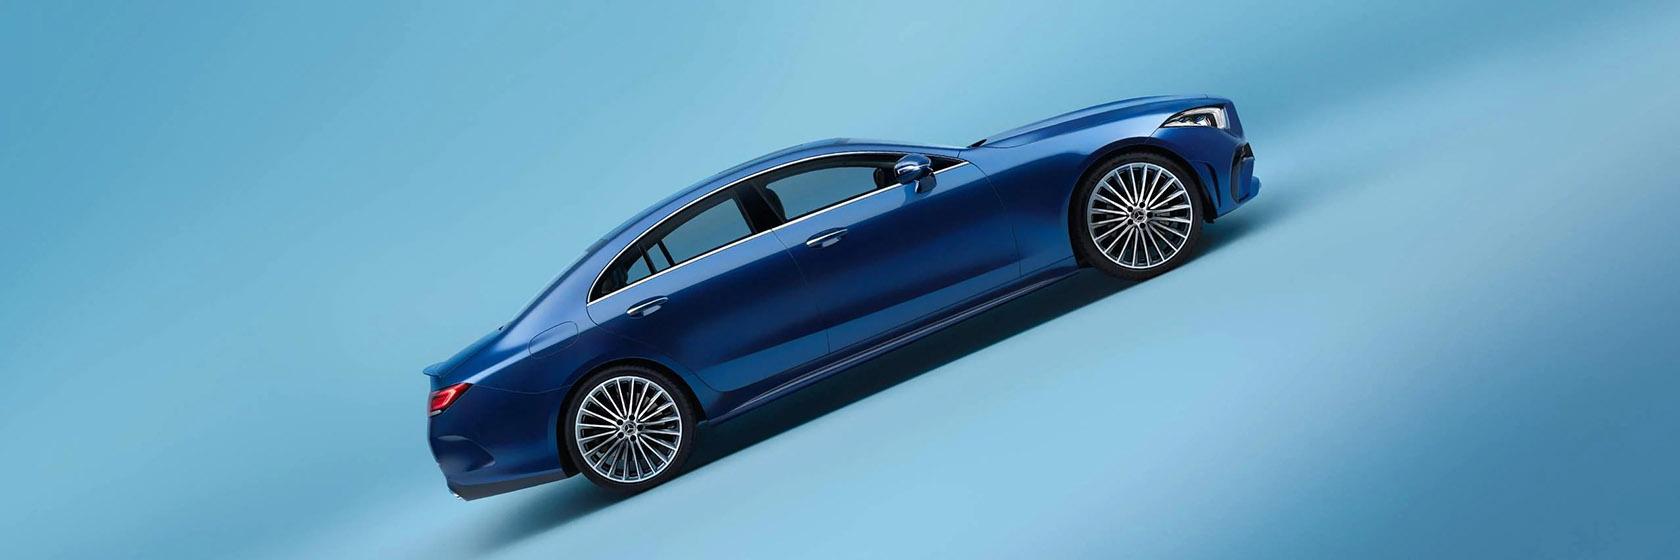 Ціна Mercedes–Benz CLS Coupe